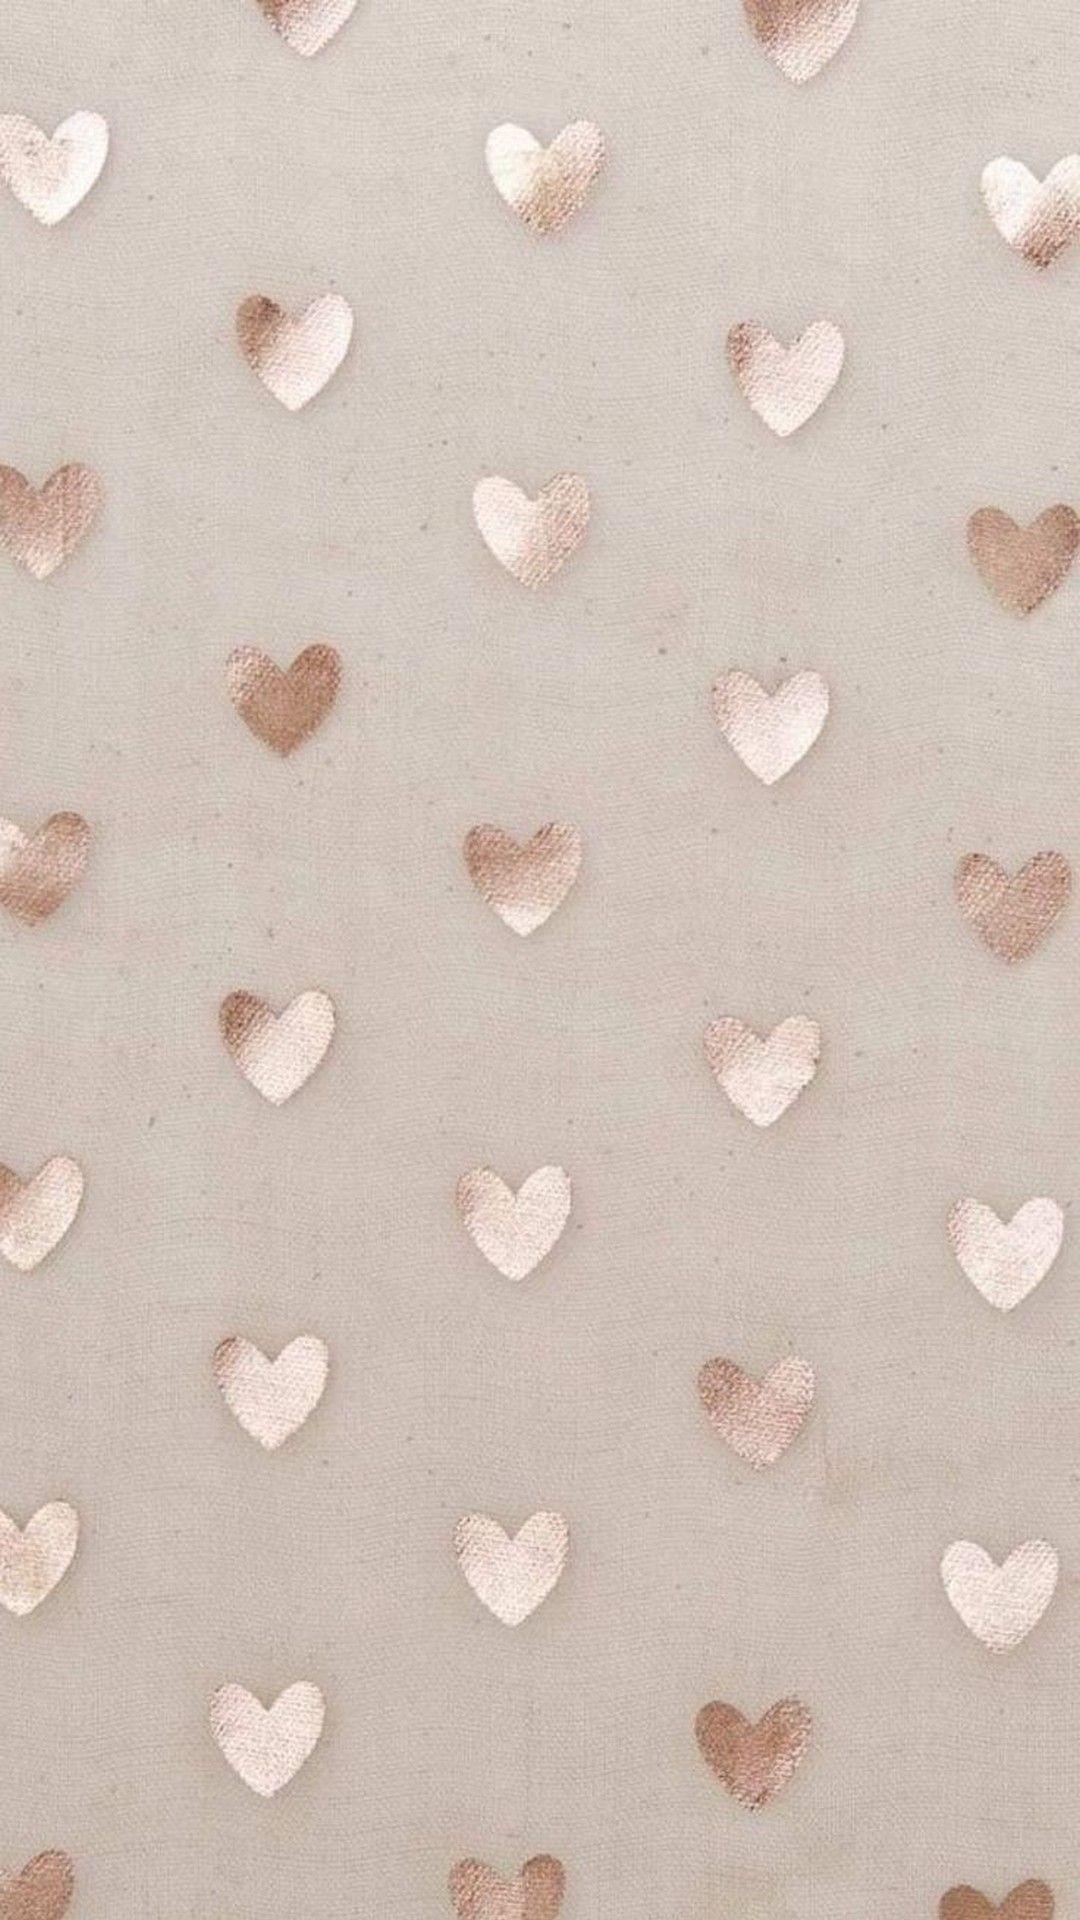 Elegant Ipad Pro Rose Gold Wallpaper Gold Wallpaper Iphone Heart Iphone Wallpaper Gold Wallpaper Background